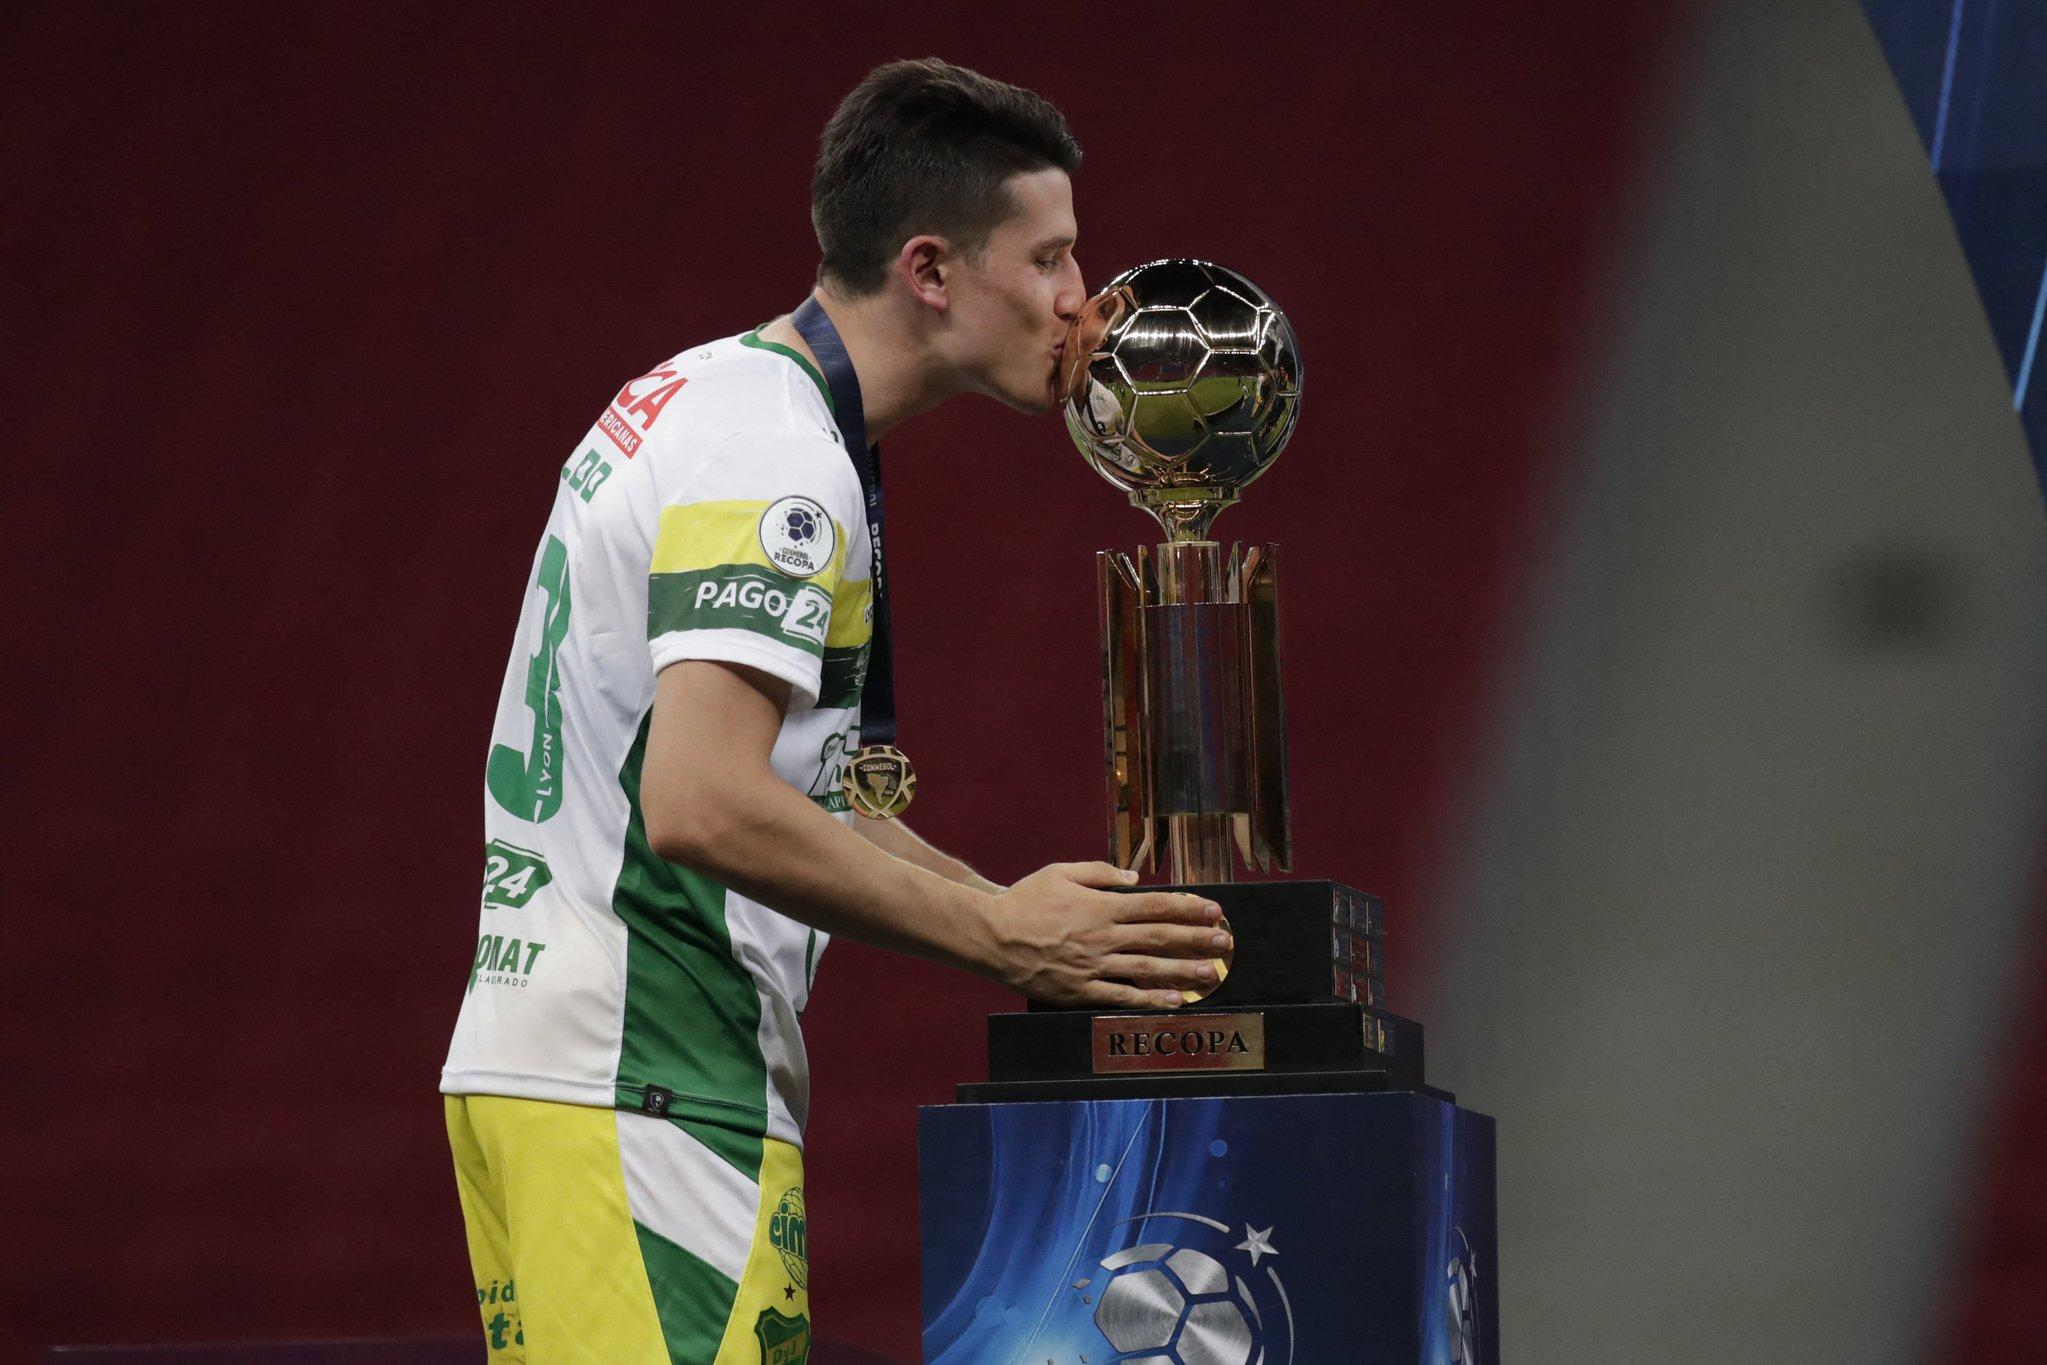 Partida aconteceu no estádio Mané Garrincha